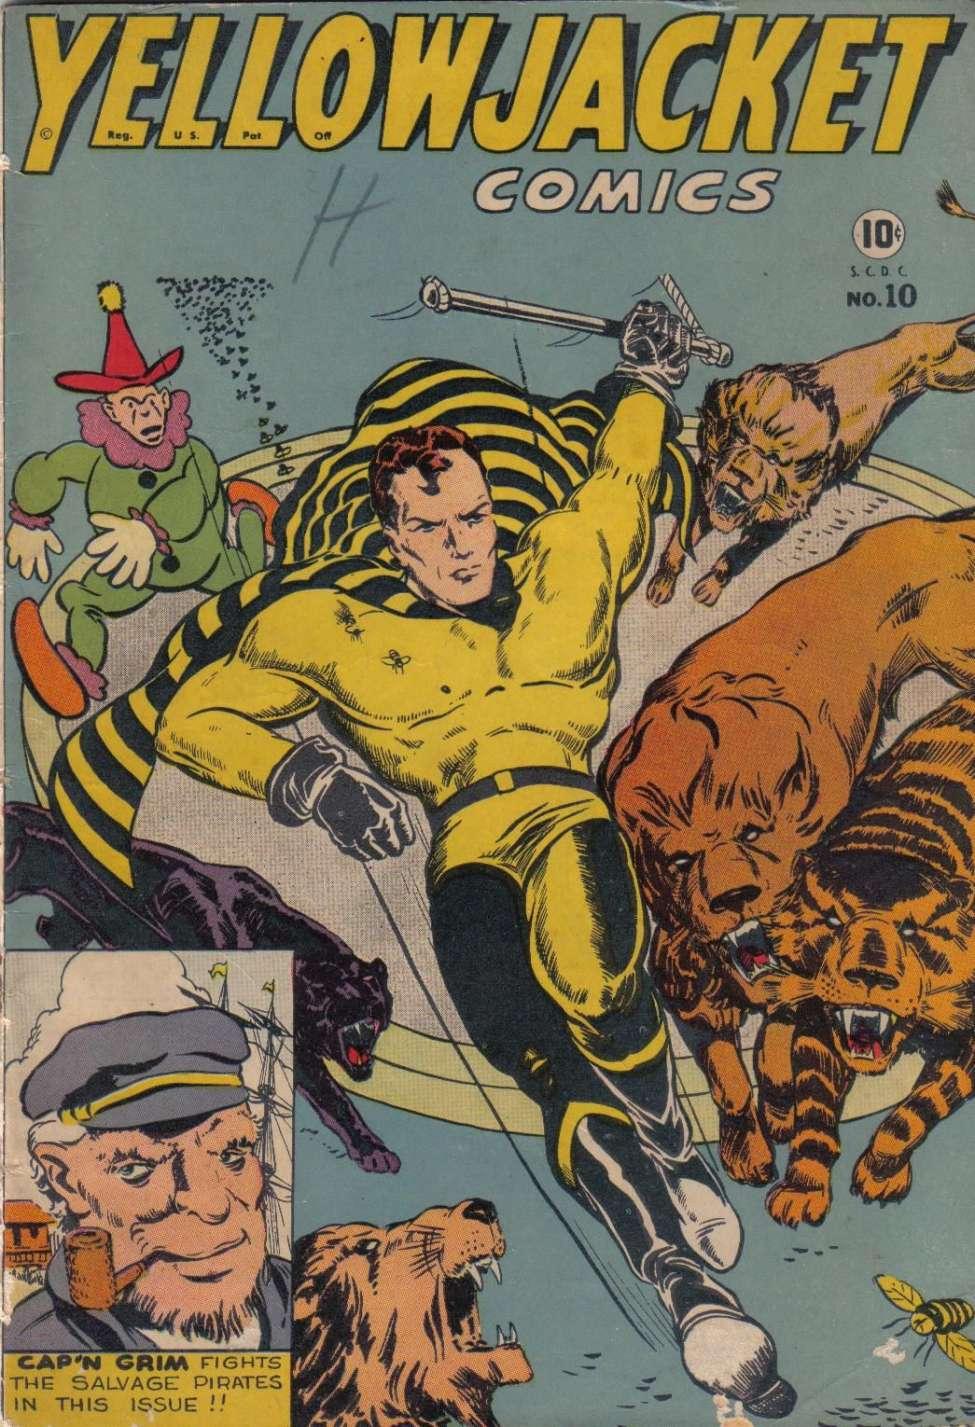 Comic Book Cover For Yellowjacket Comics #10